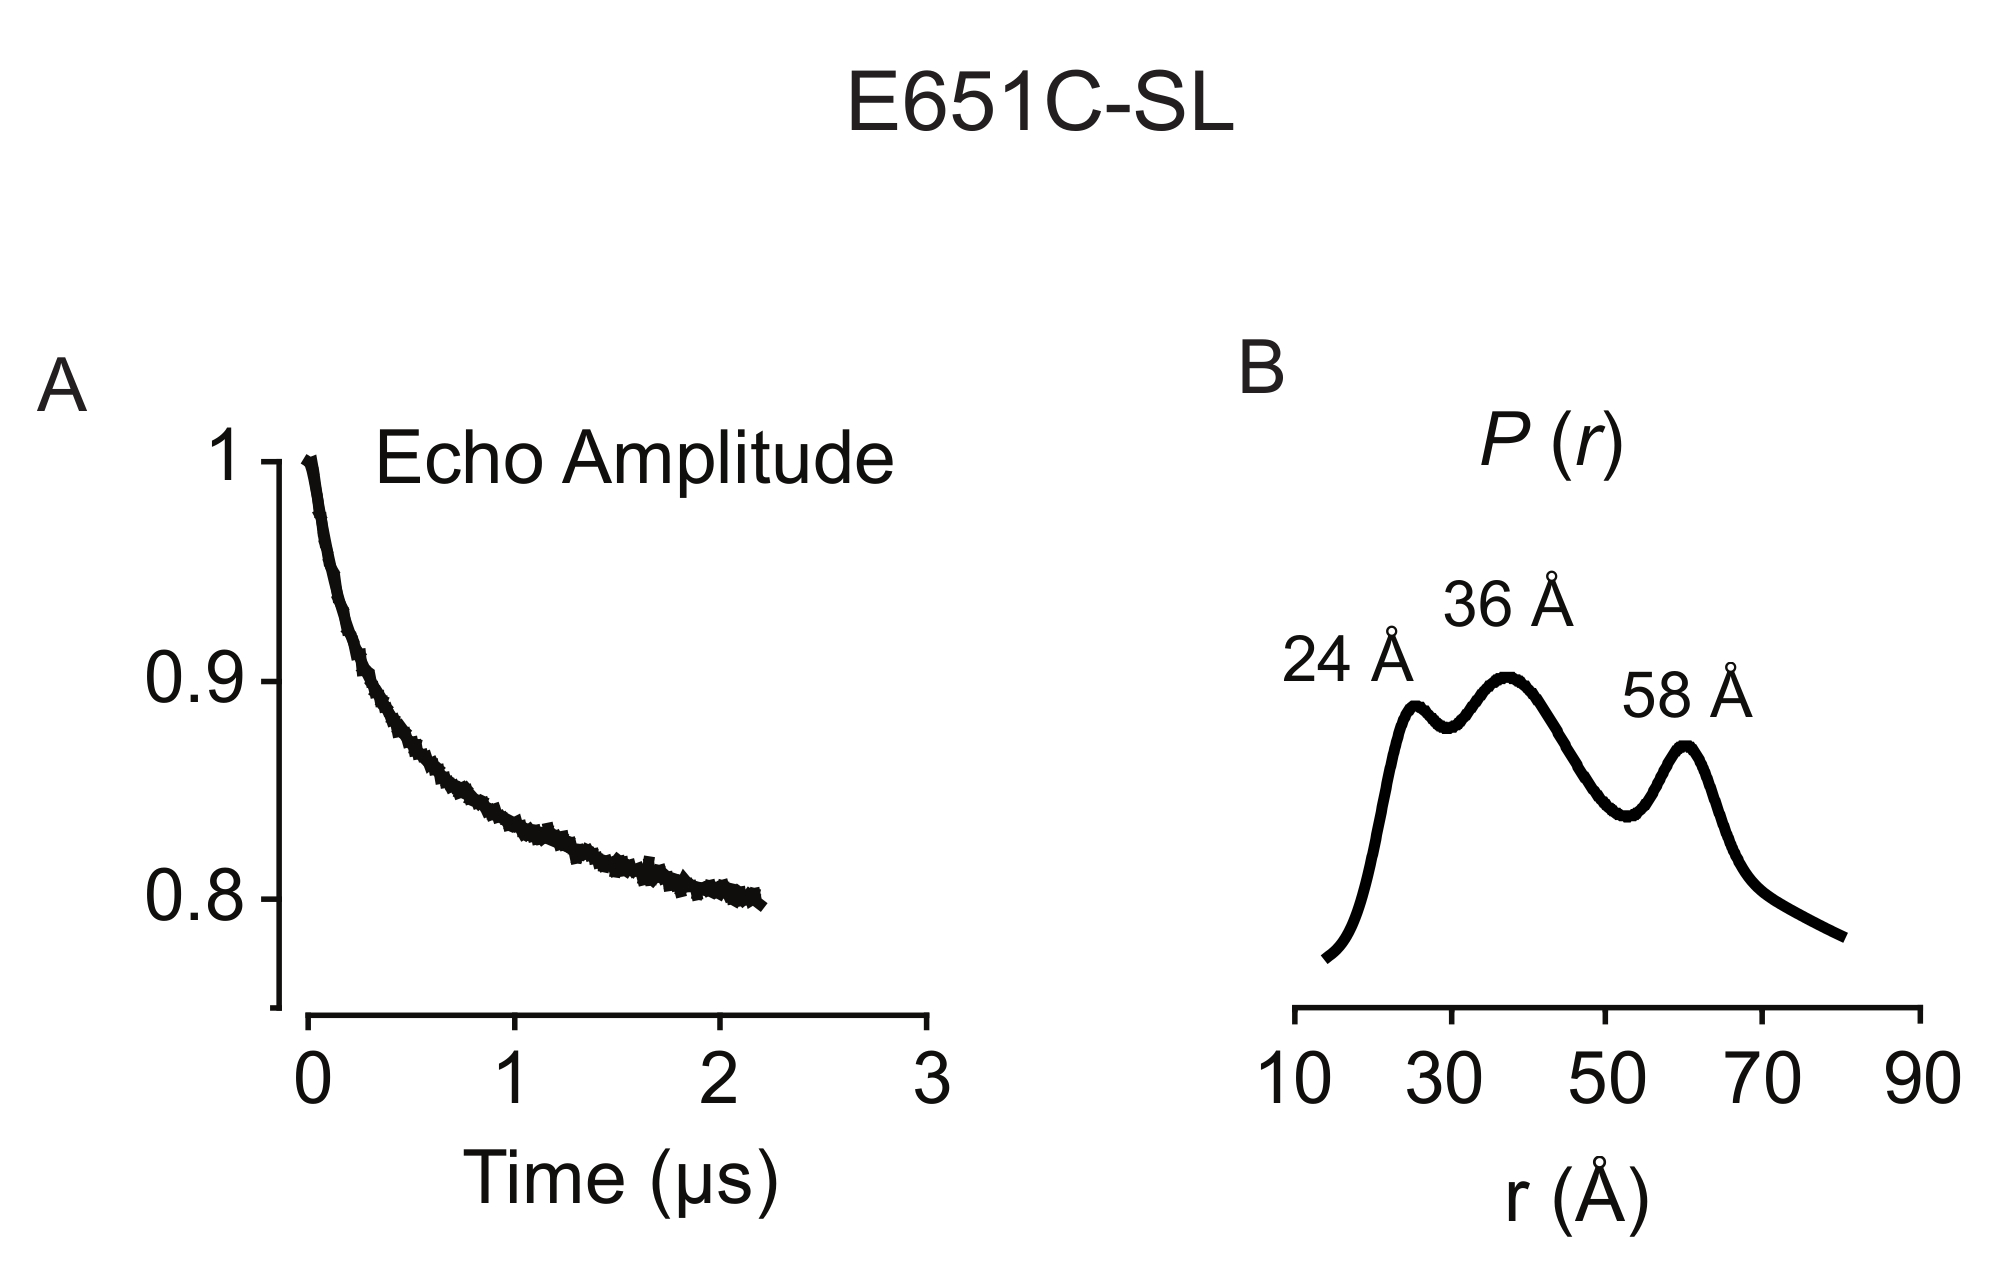 carbon dating eksponentiel henfald